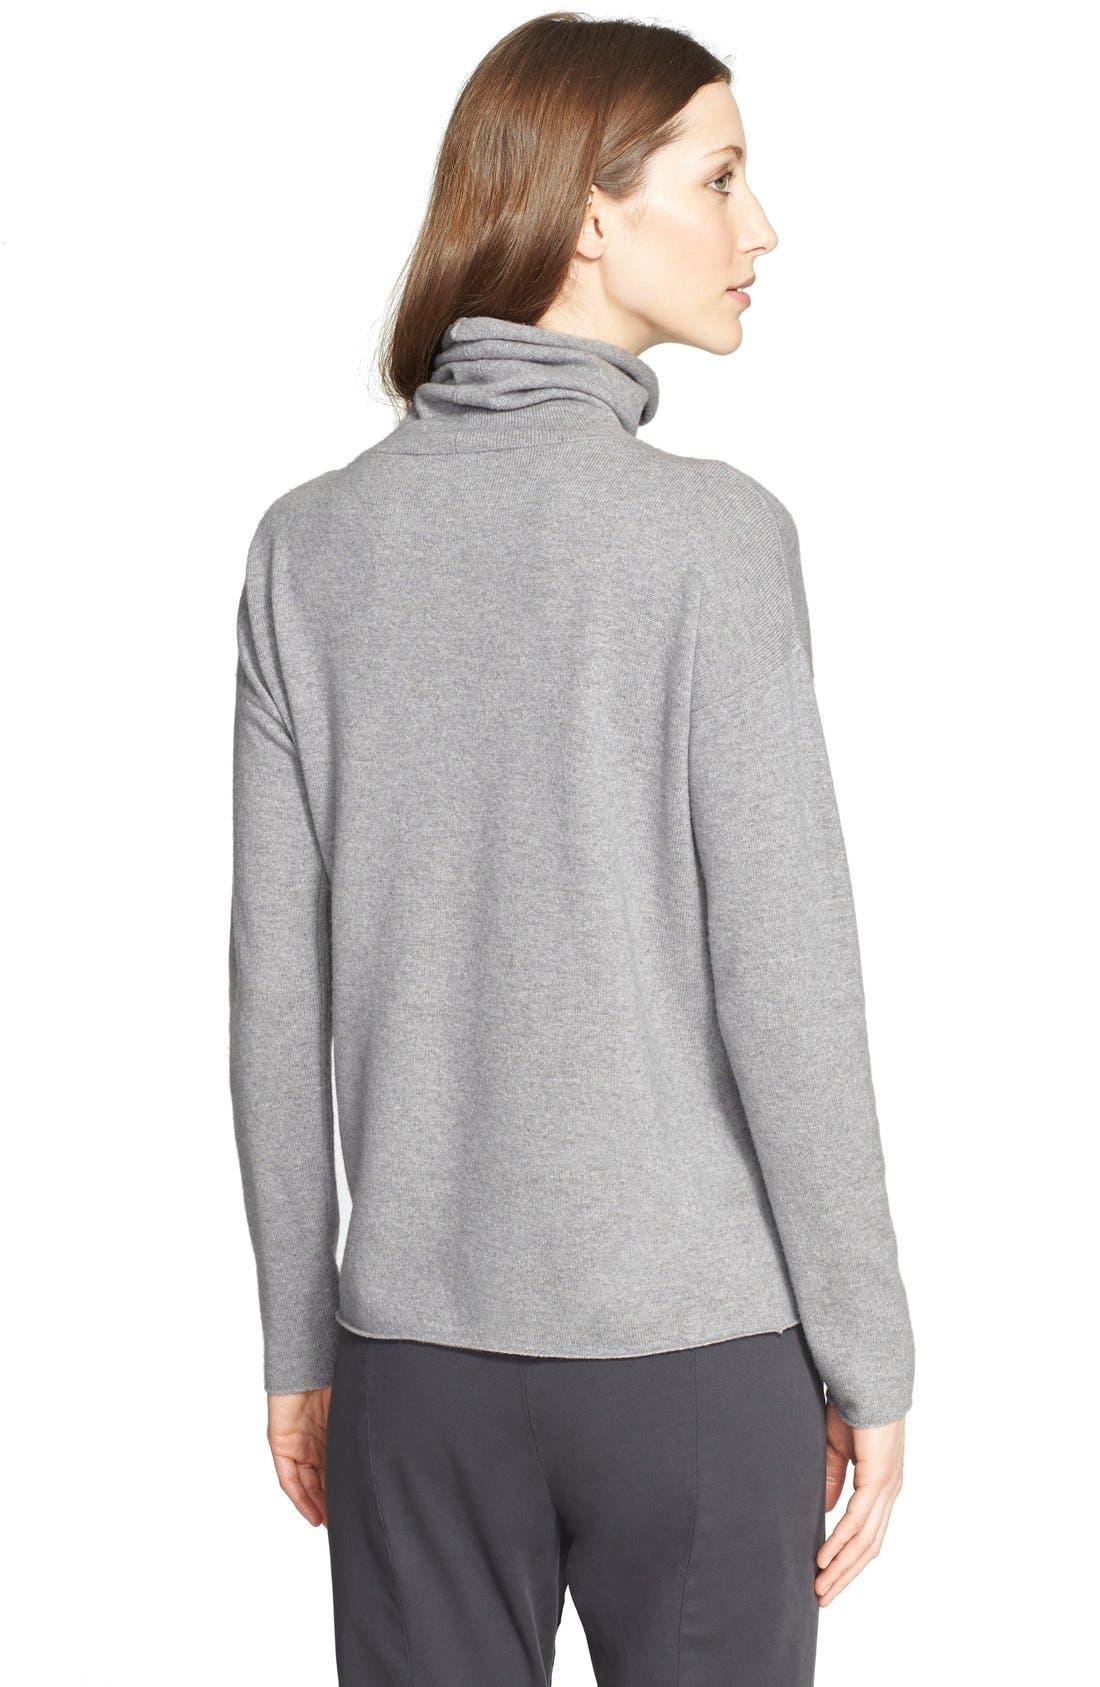 Alternate Image 2  - Fabiana Filippi Suede Contrast Wool Blend Turtleneck Sweater